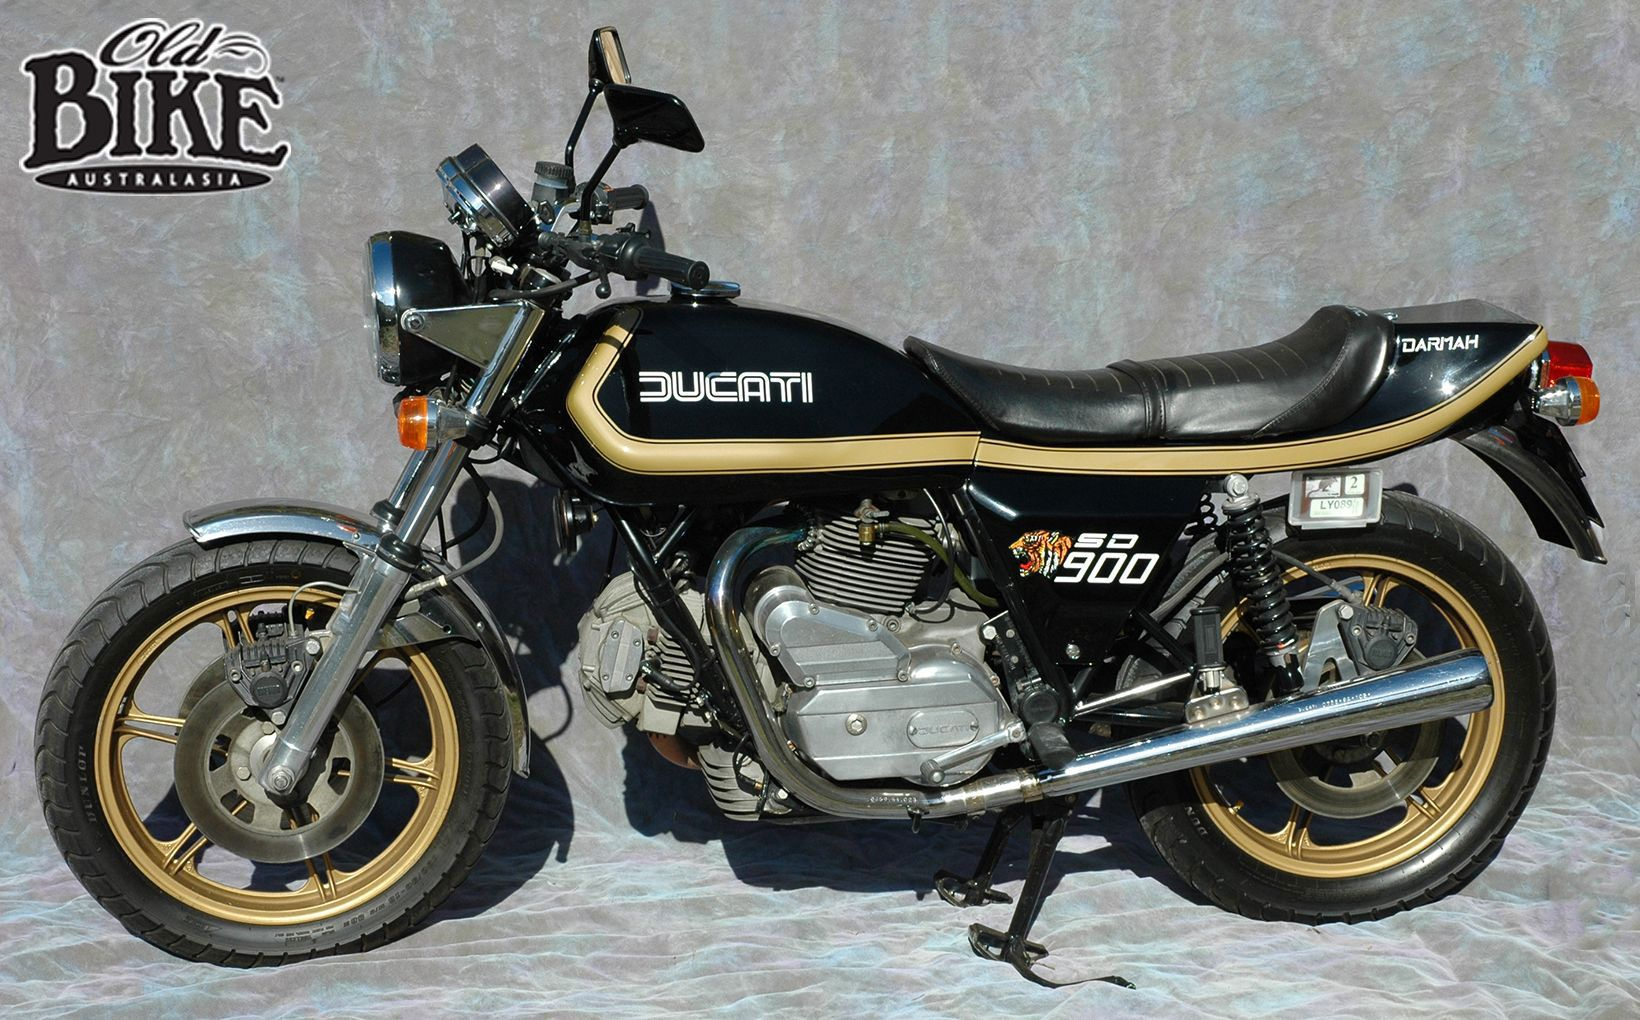 SD 900 Ducati Darmah - An Alsatian in Tiger's clothing - Shannons Club